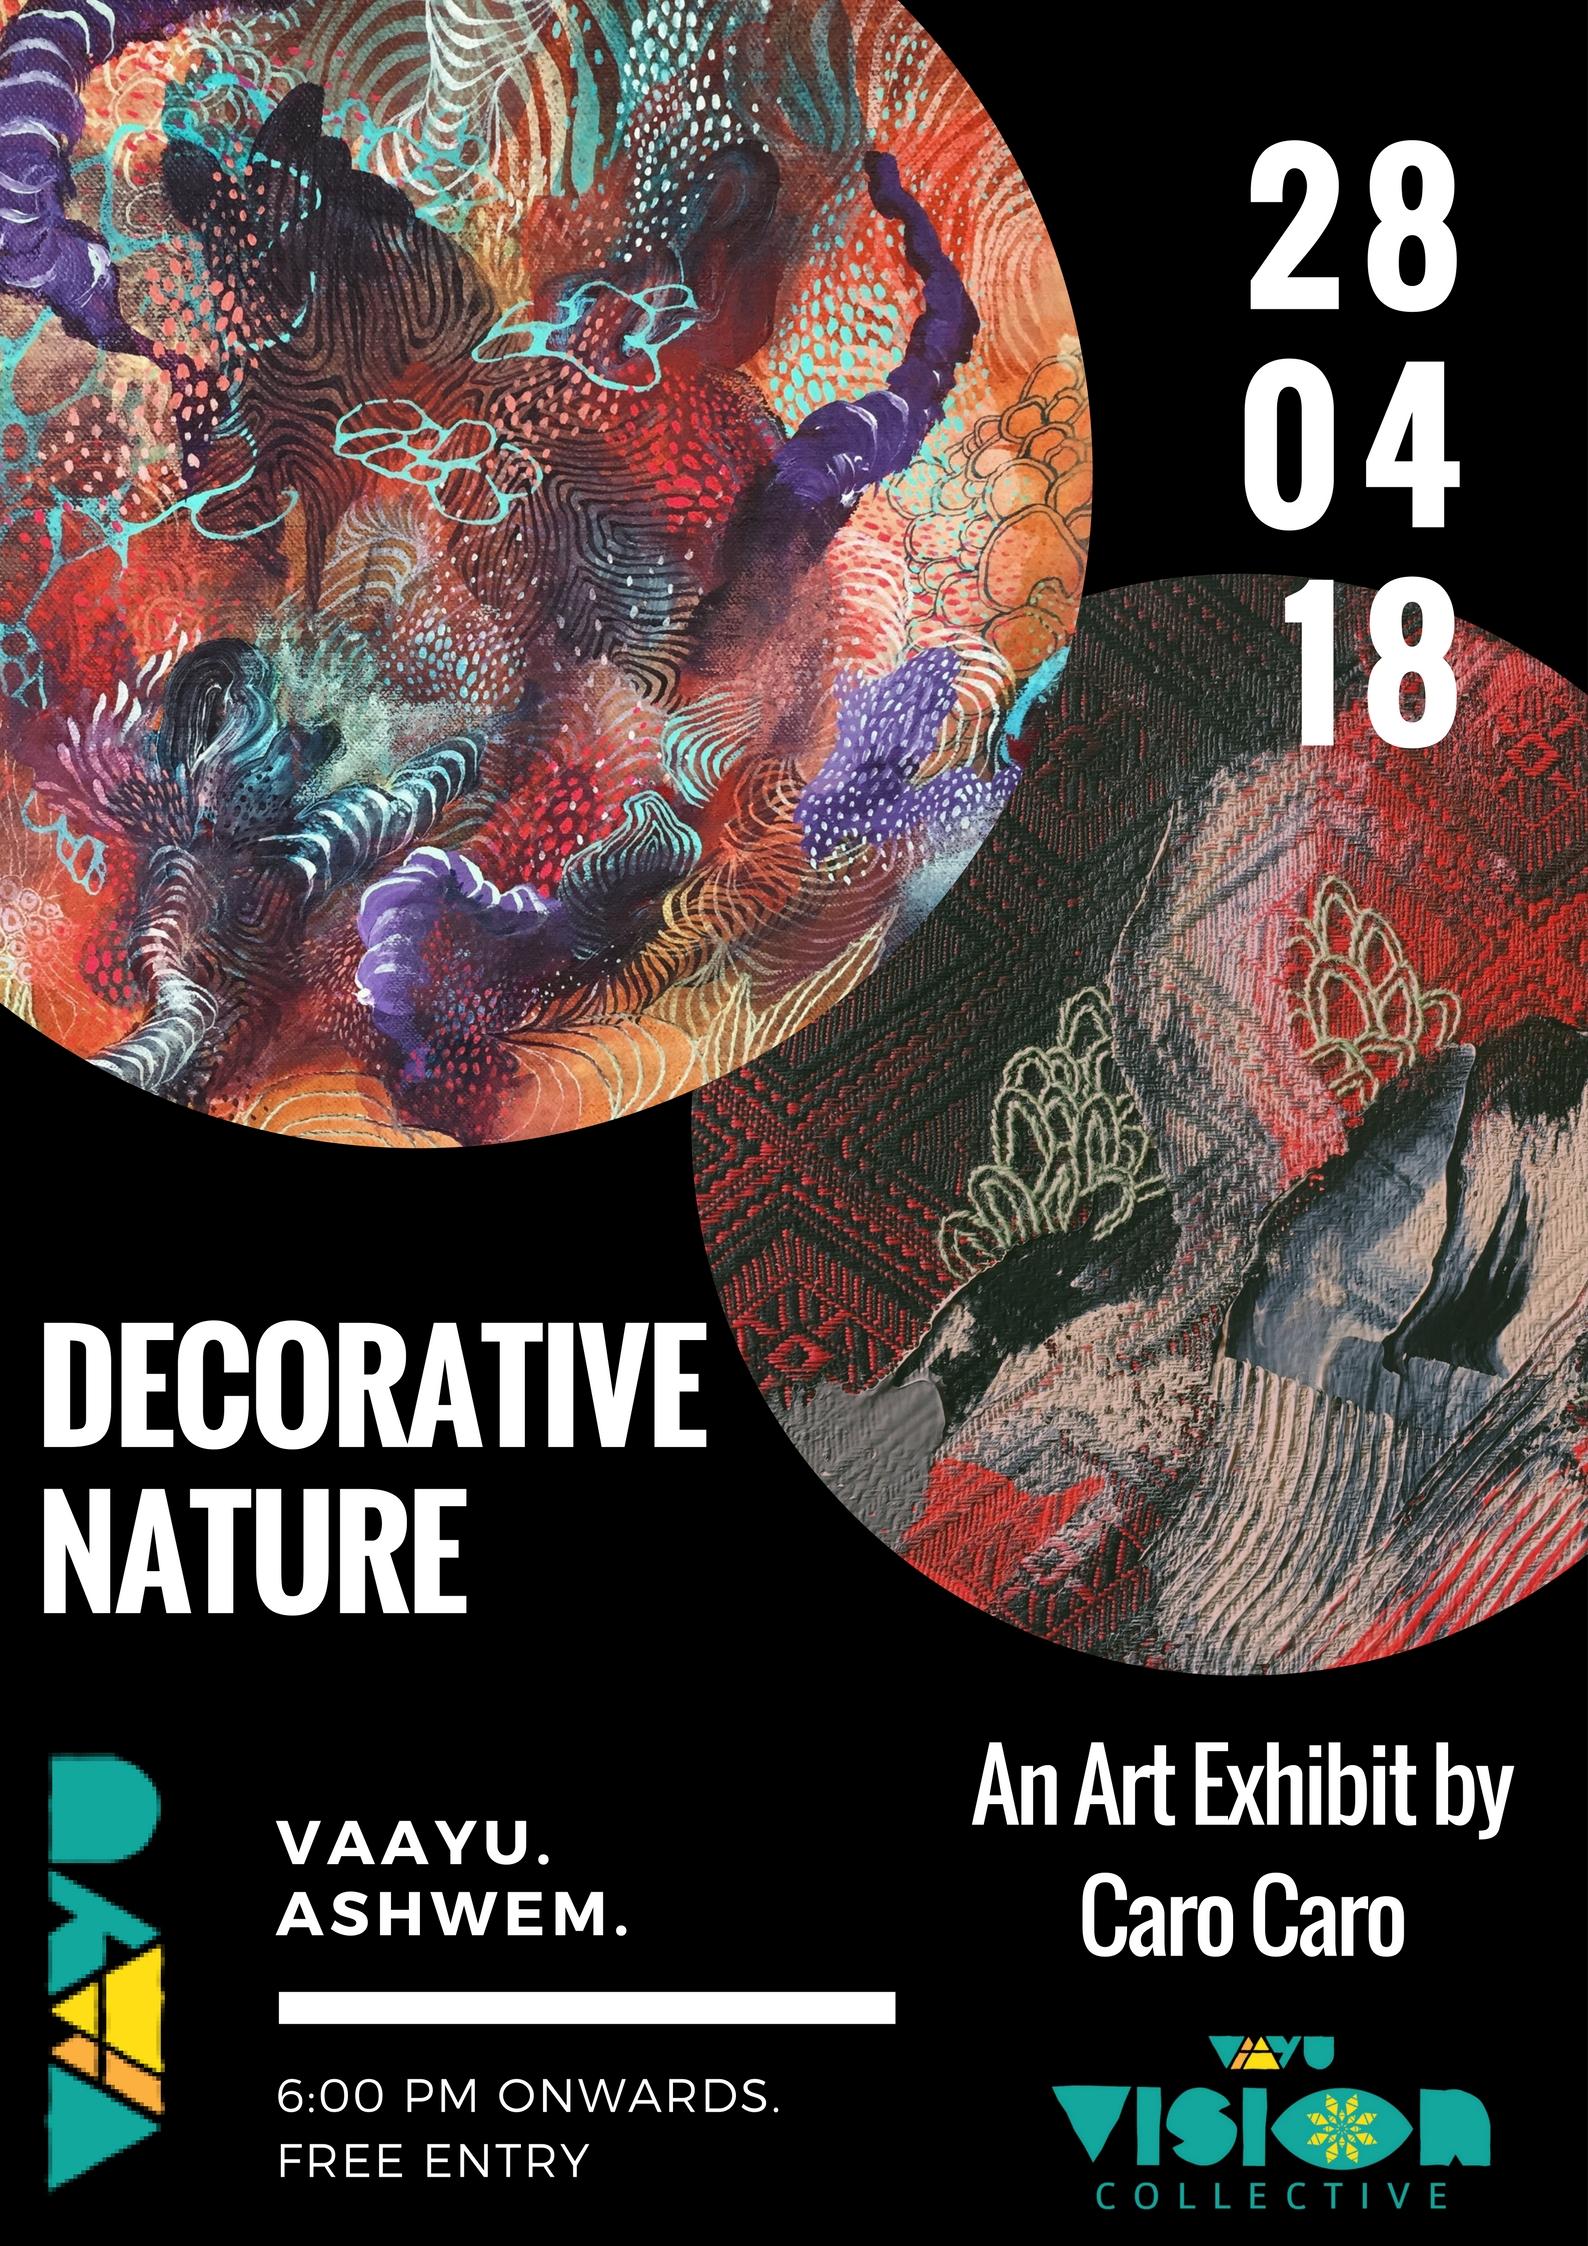 Decorative Nature